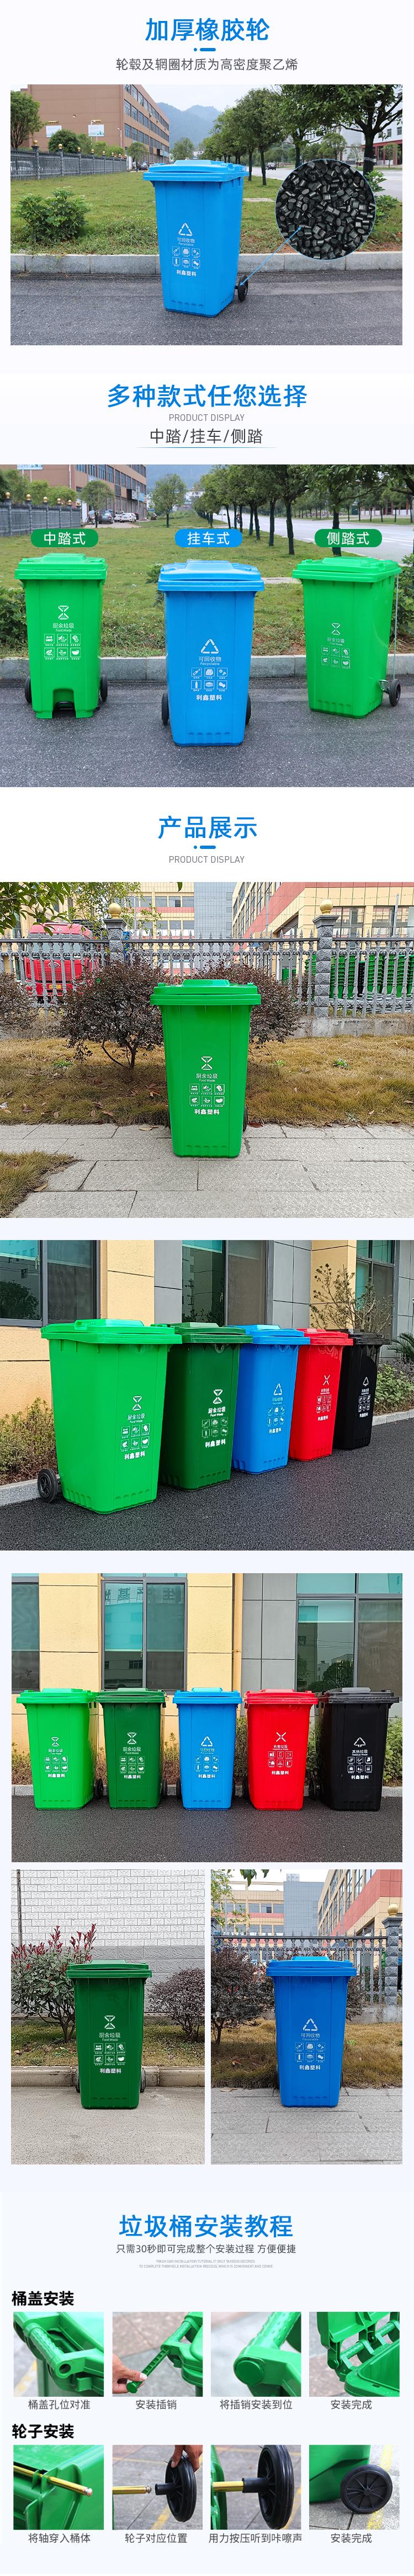 240L分类垃圾桶批发